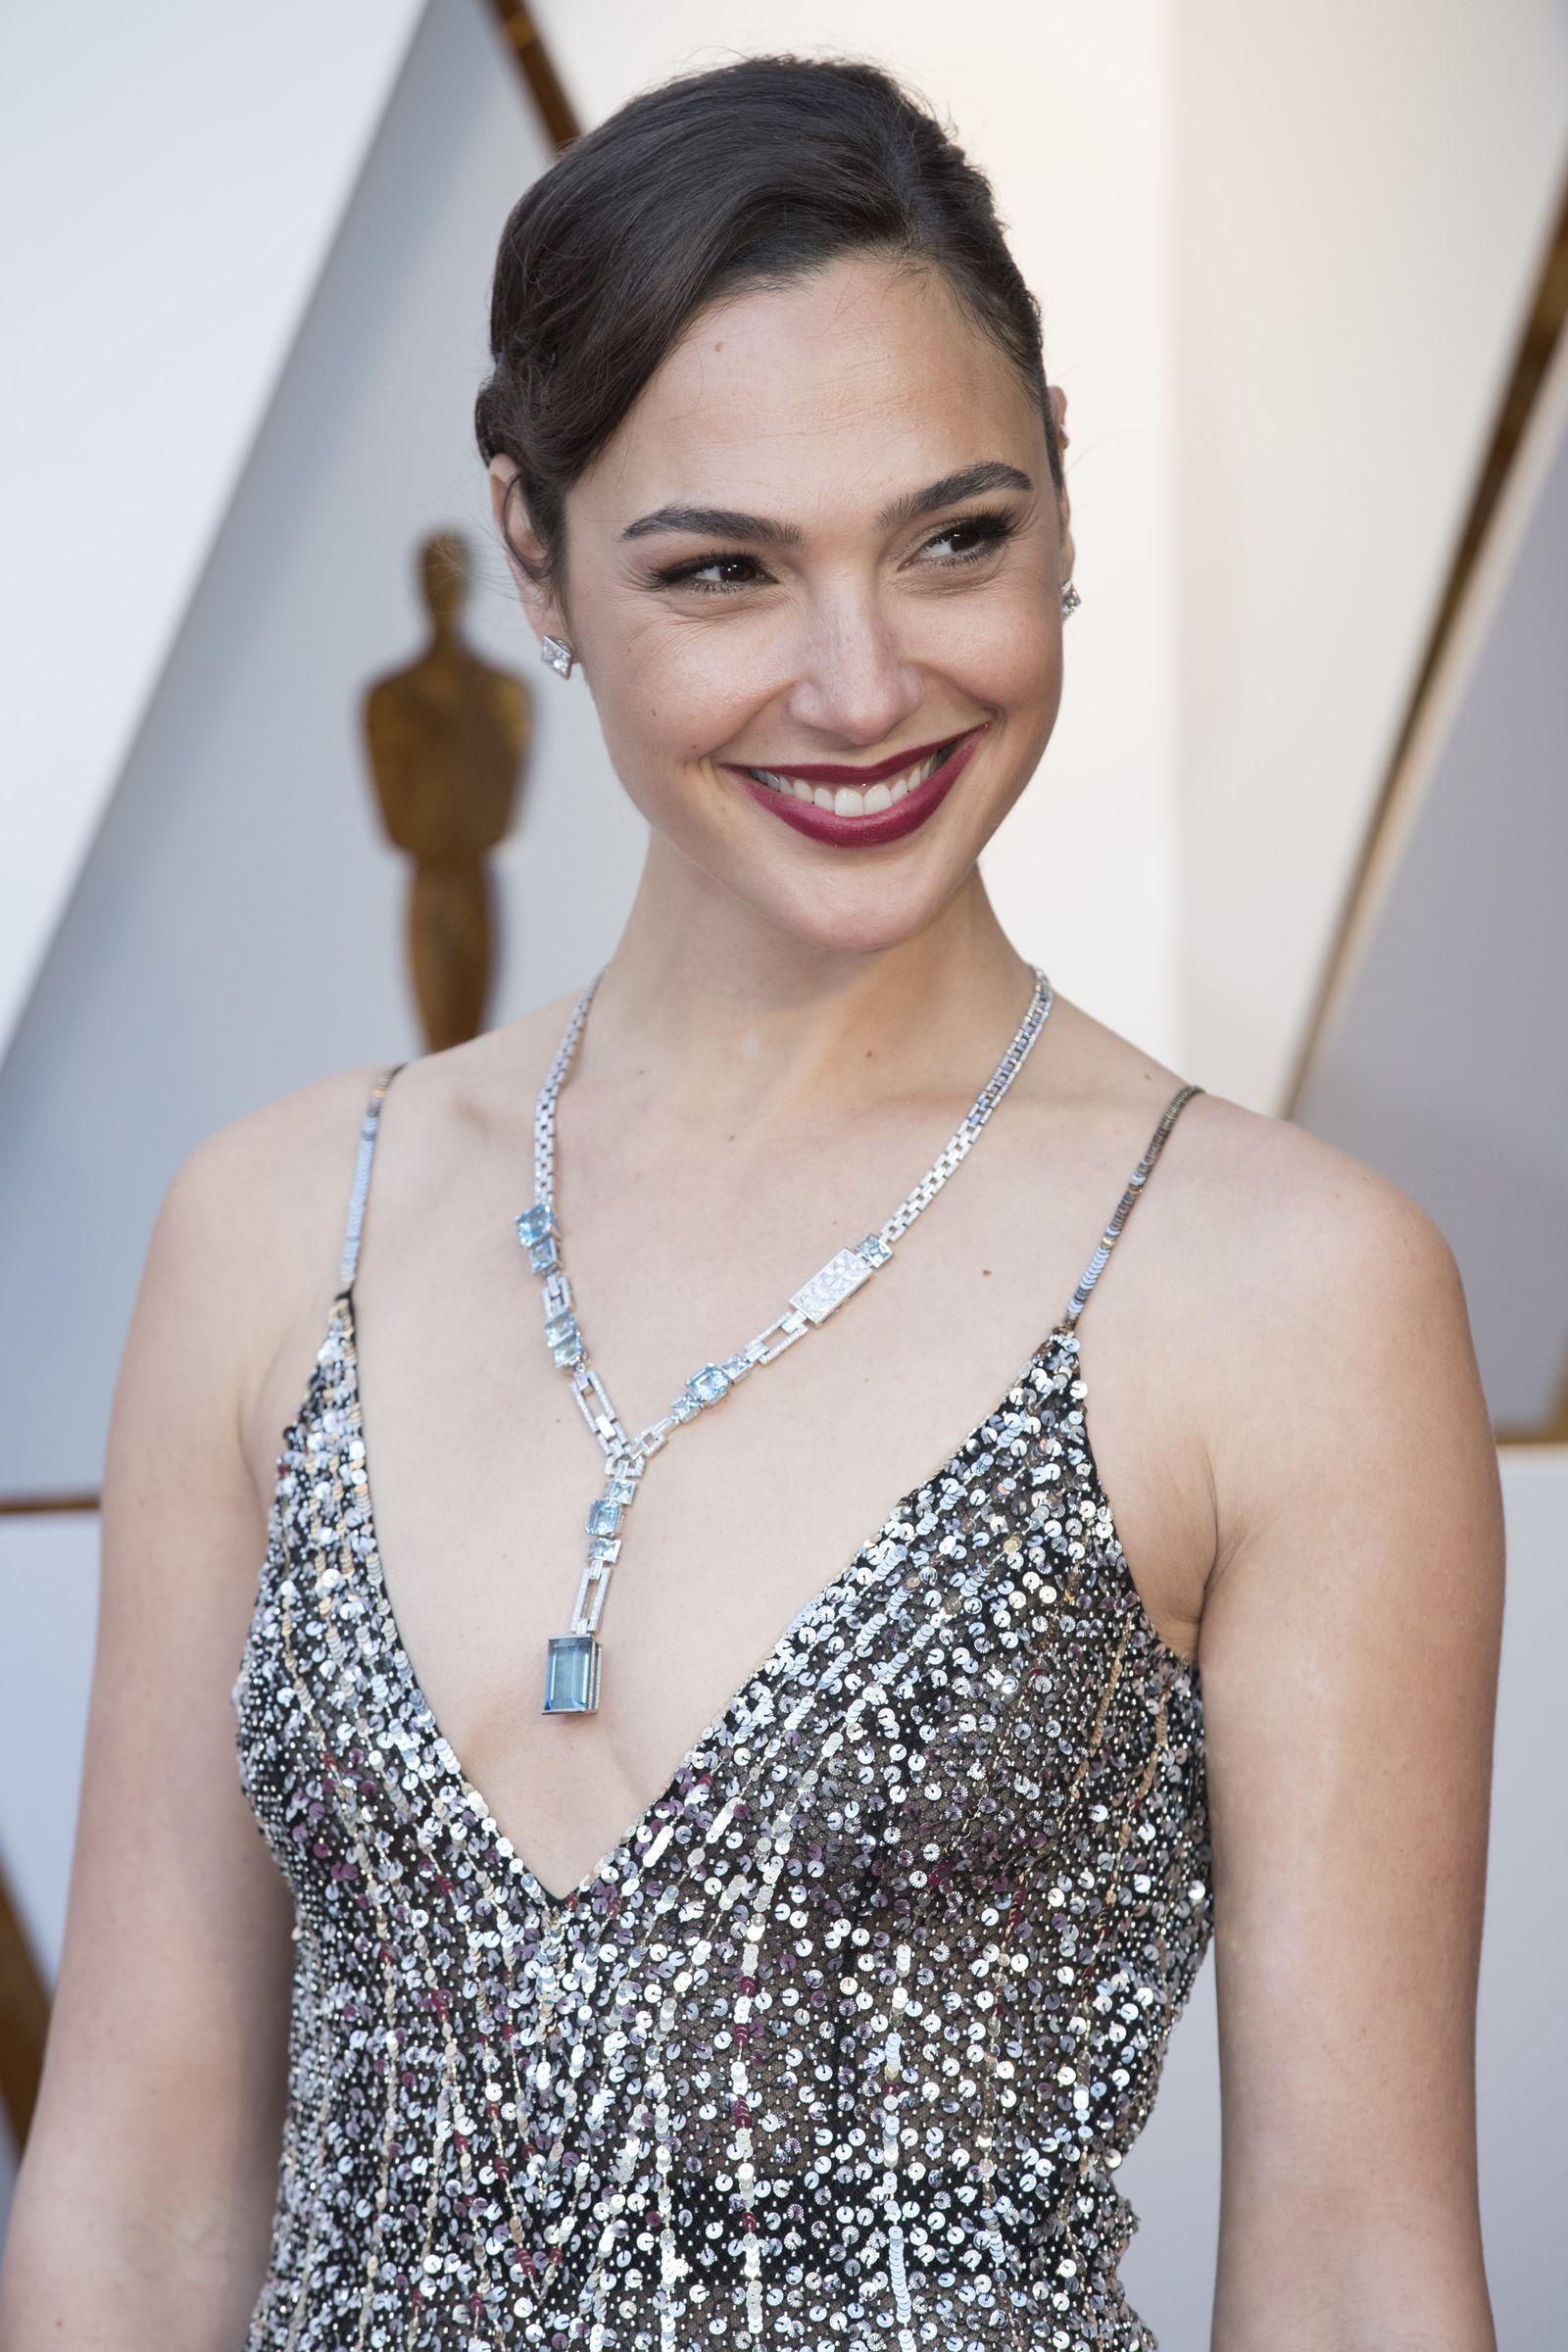 Gal Gadot Is Dripping In Diamonds At The 2018 Oscars - HarpersBAZAAR.com